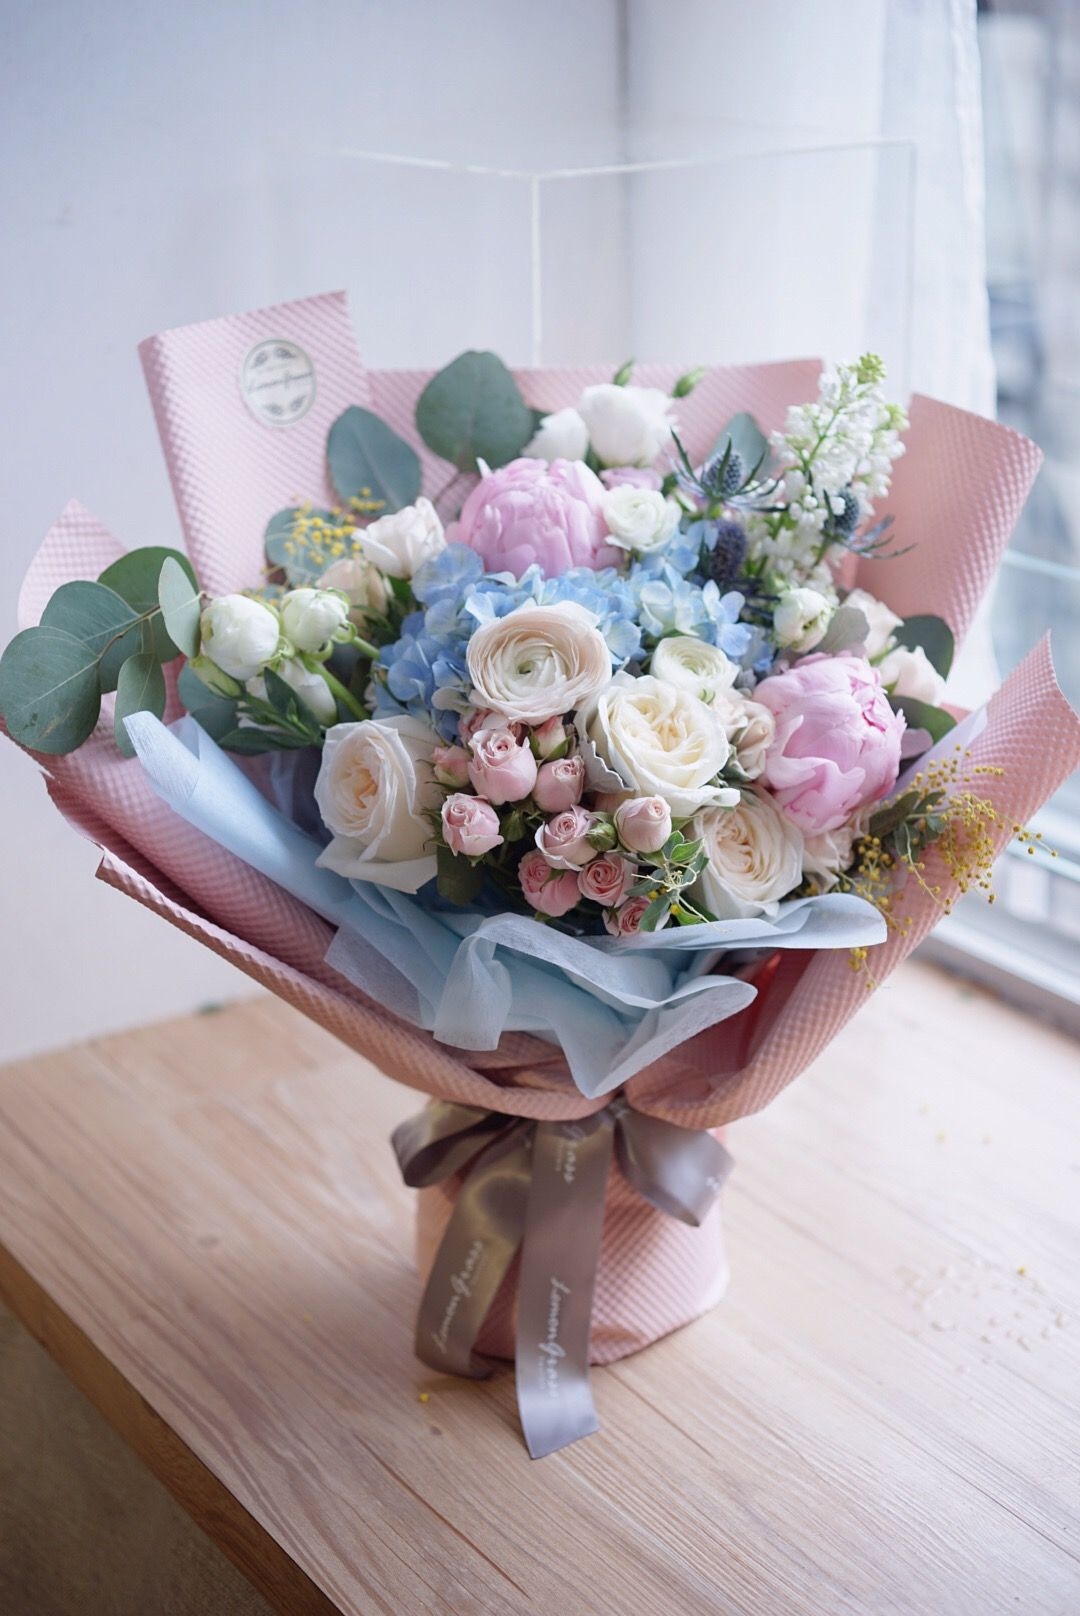 Pin By Lemongrasswedding On Full Size Fresh Flower Gift Bouquet Birthday Flowers Bouquet Luxury Flower Arrangement Luxury Flowers